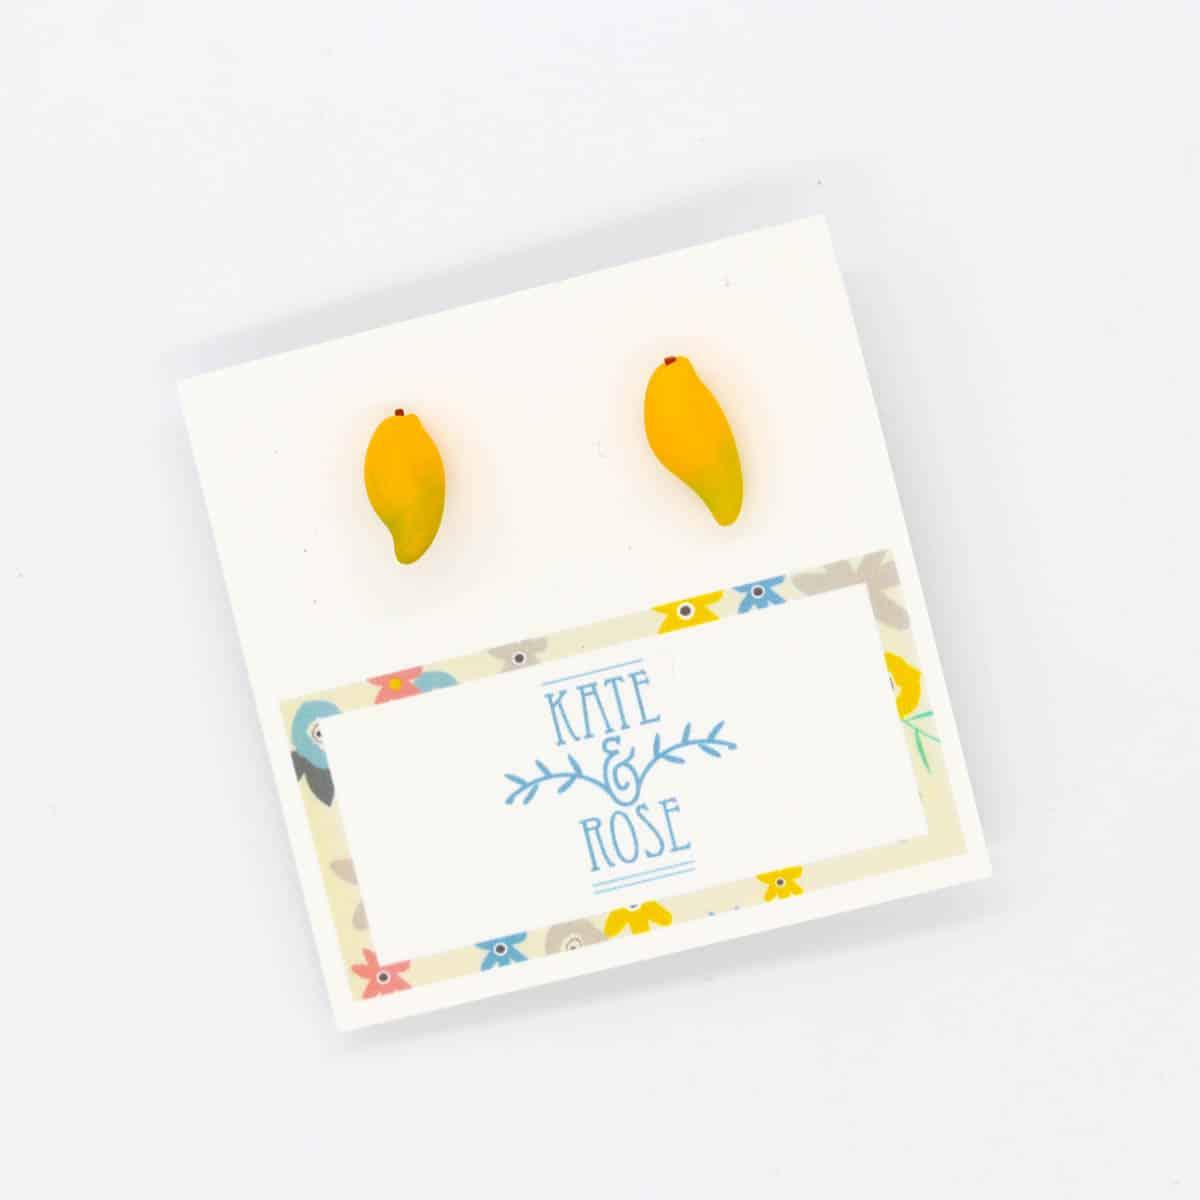 mango-studs-earrings-by-kate-and-rose-prahran-912308-katenrosetea